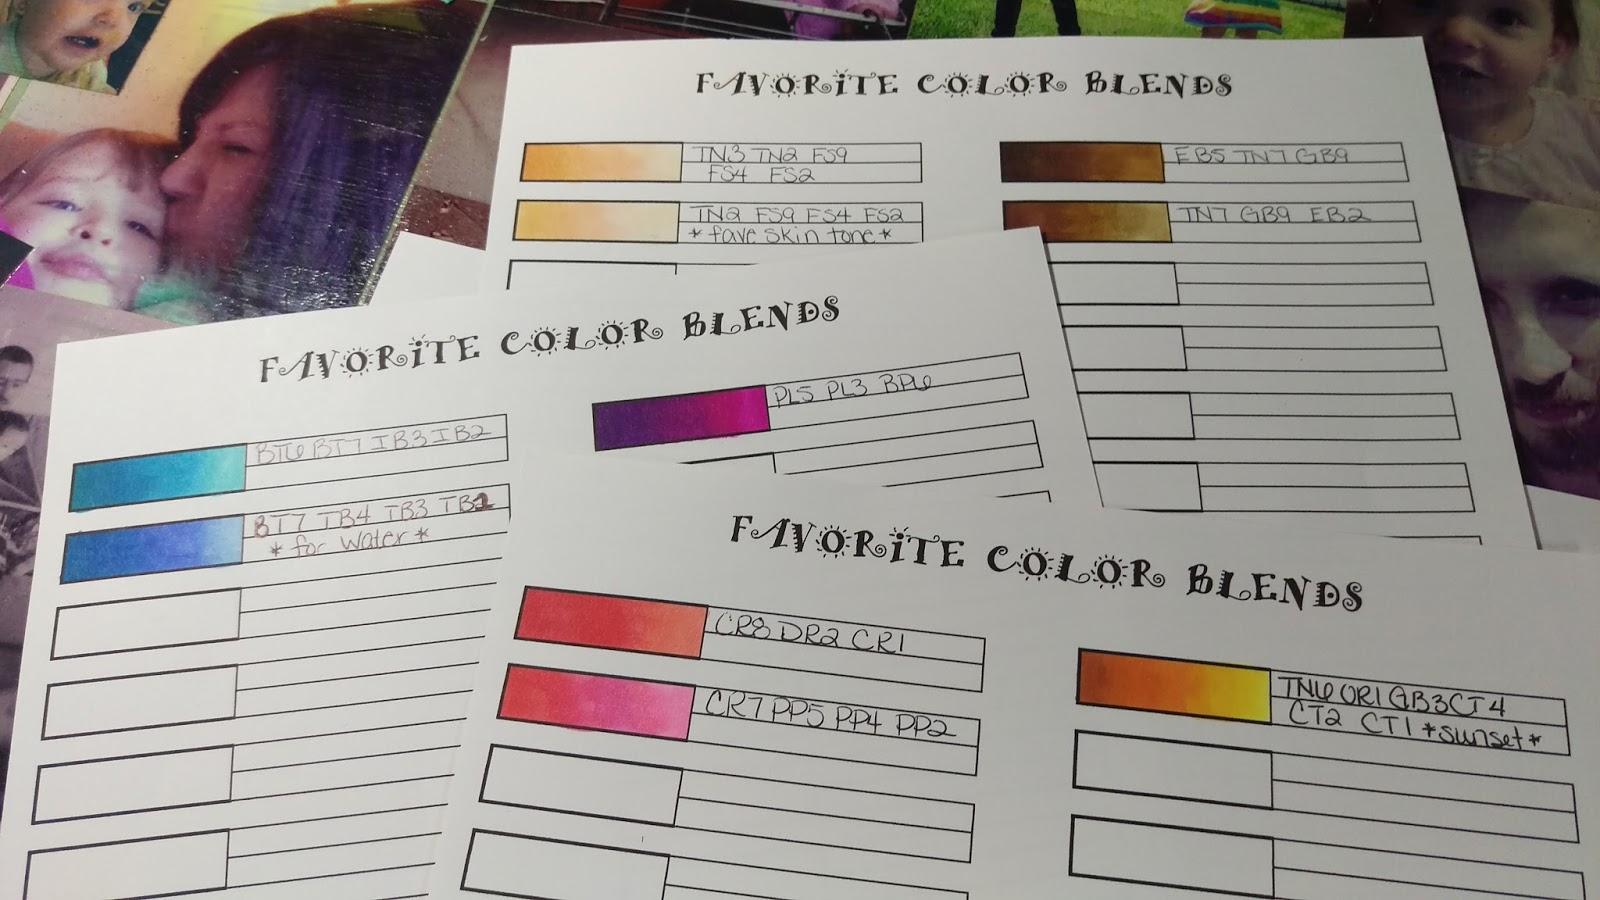 Mari ko creations spectrum noir color blend chart free download get your free color blend chart nvjuhfo Image collections